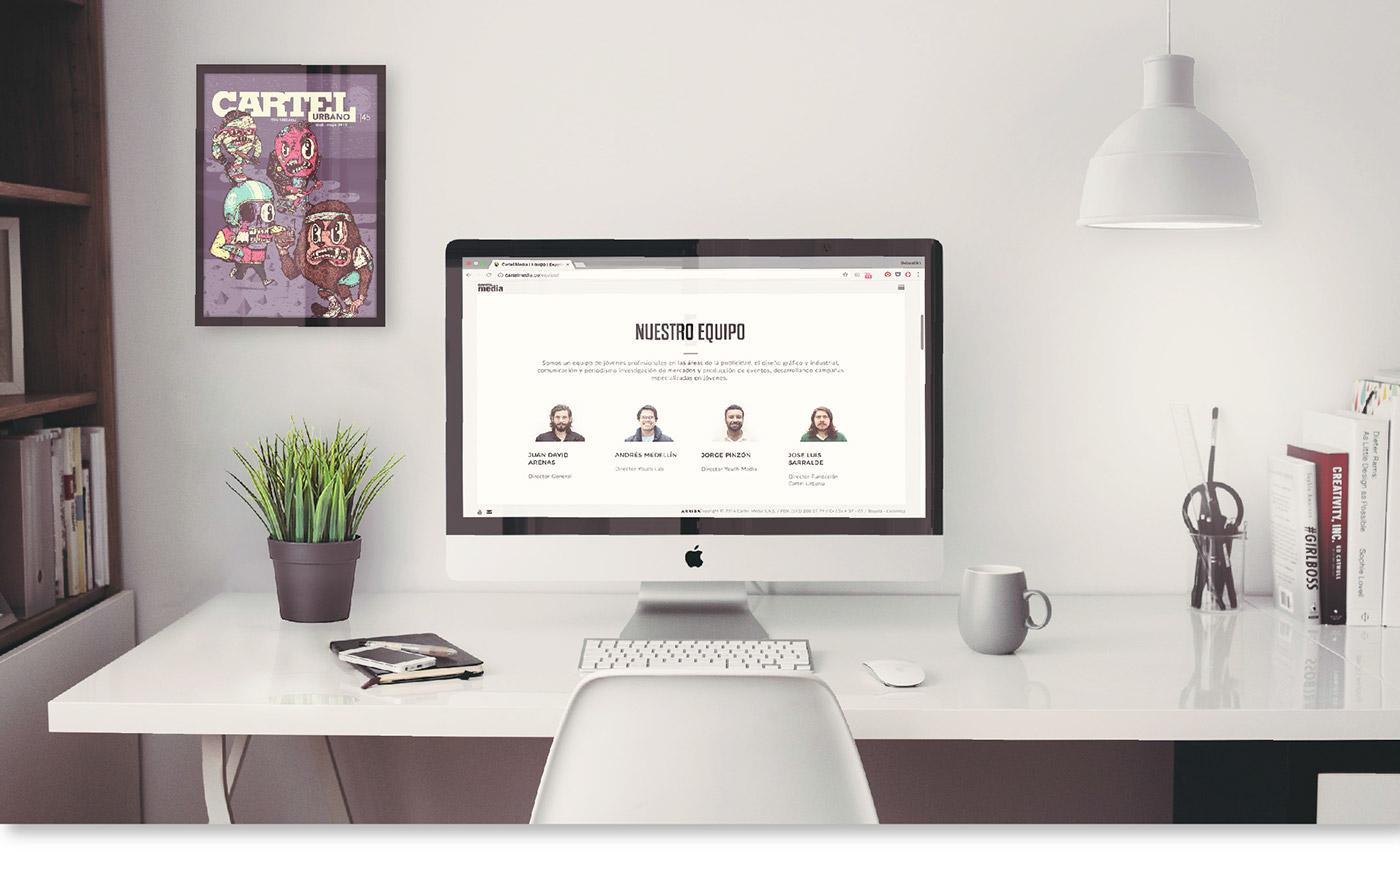 cartel media Cartel Urbano webpage cartel design front-end wordpress wireframes